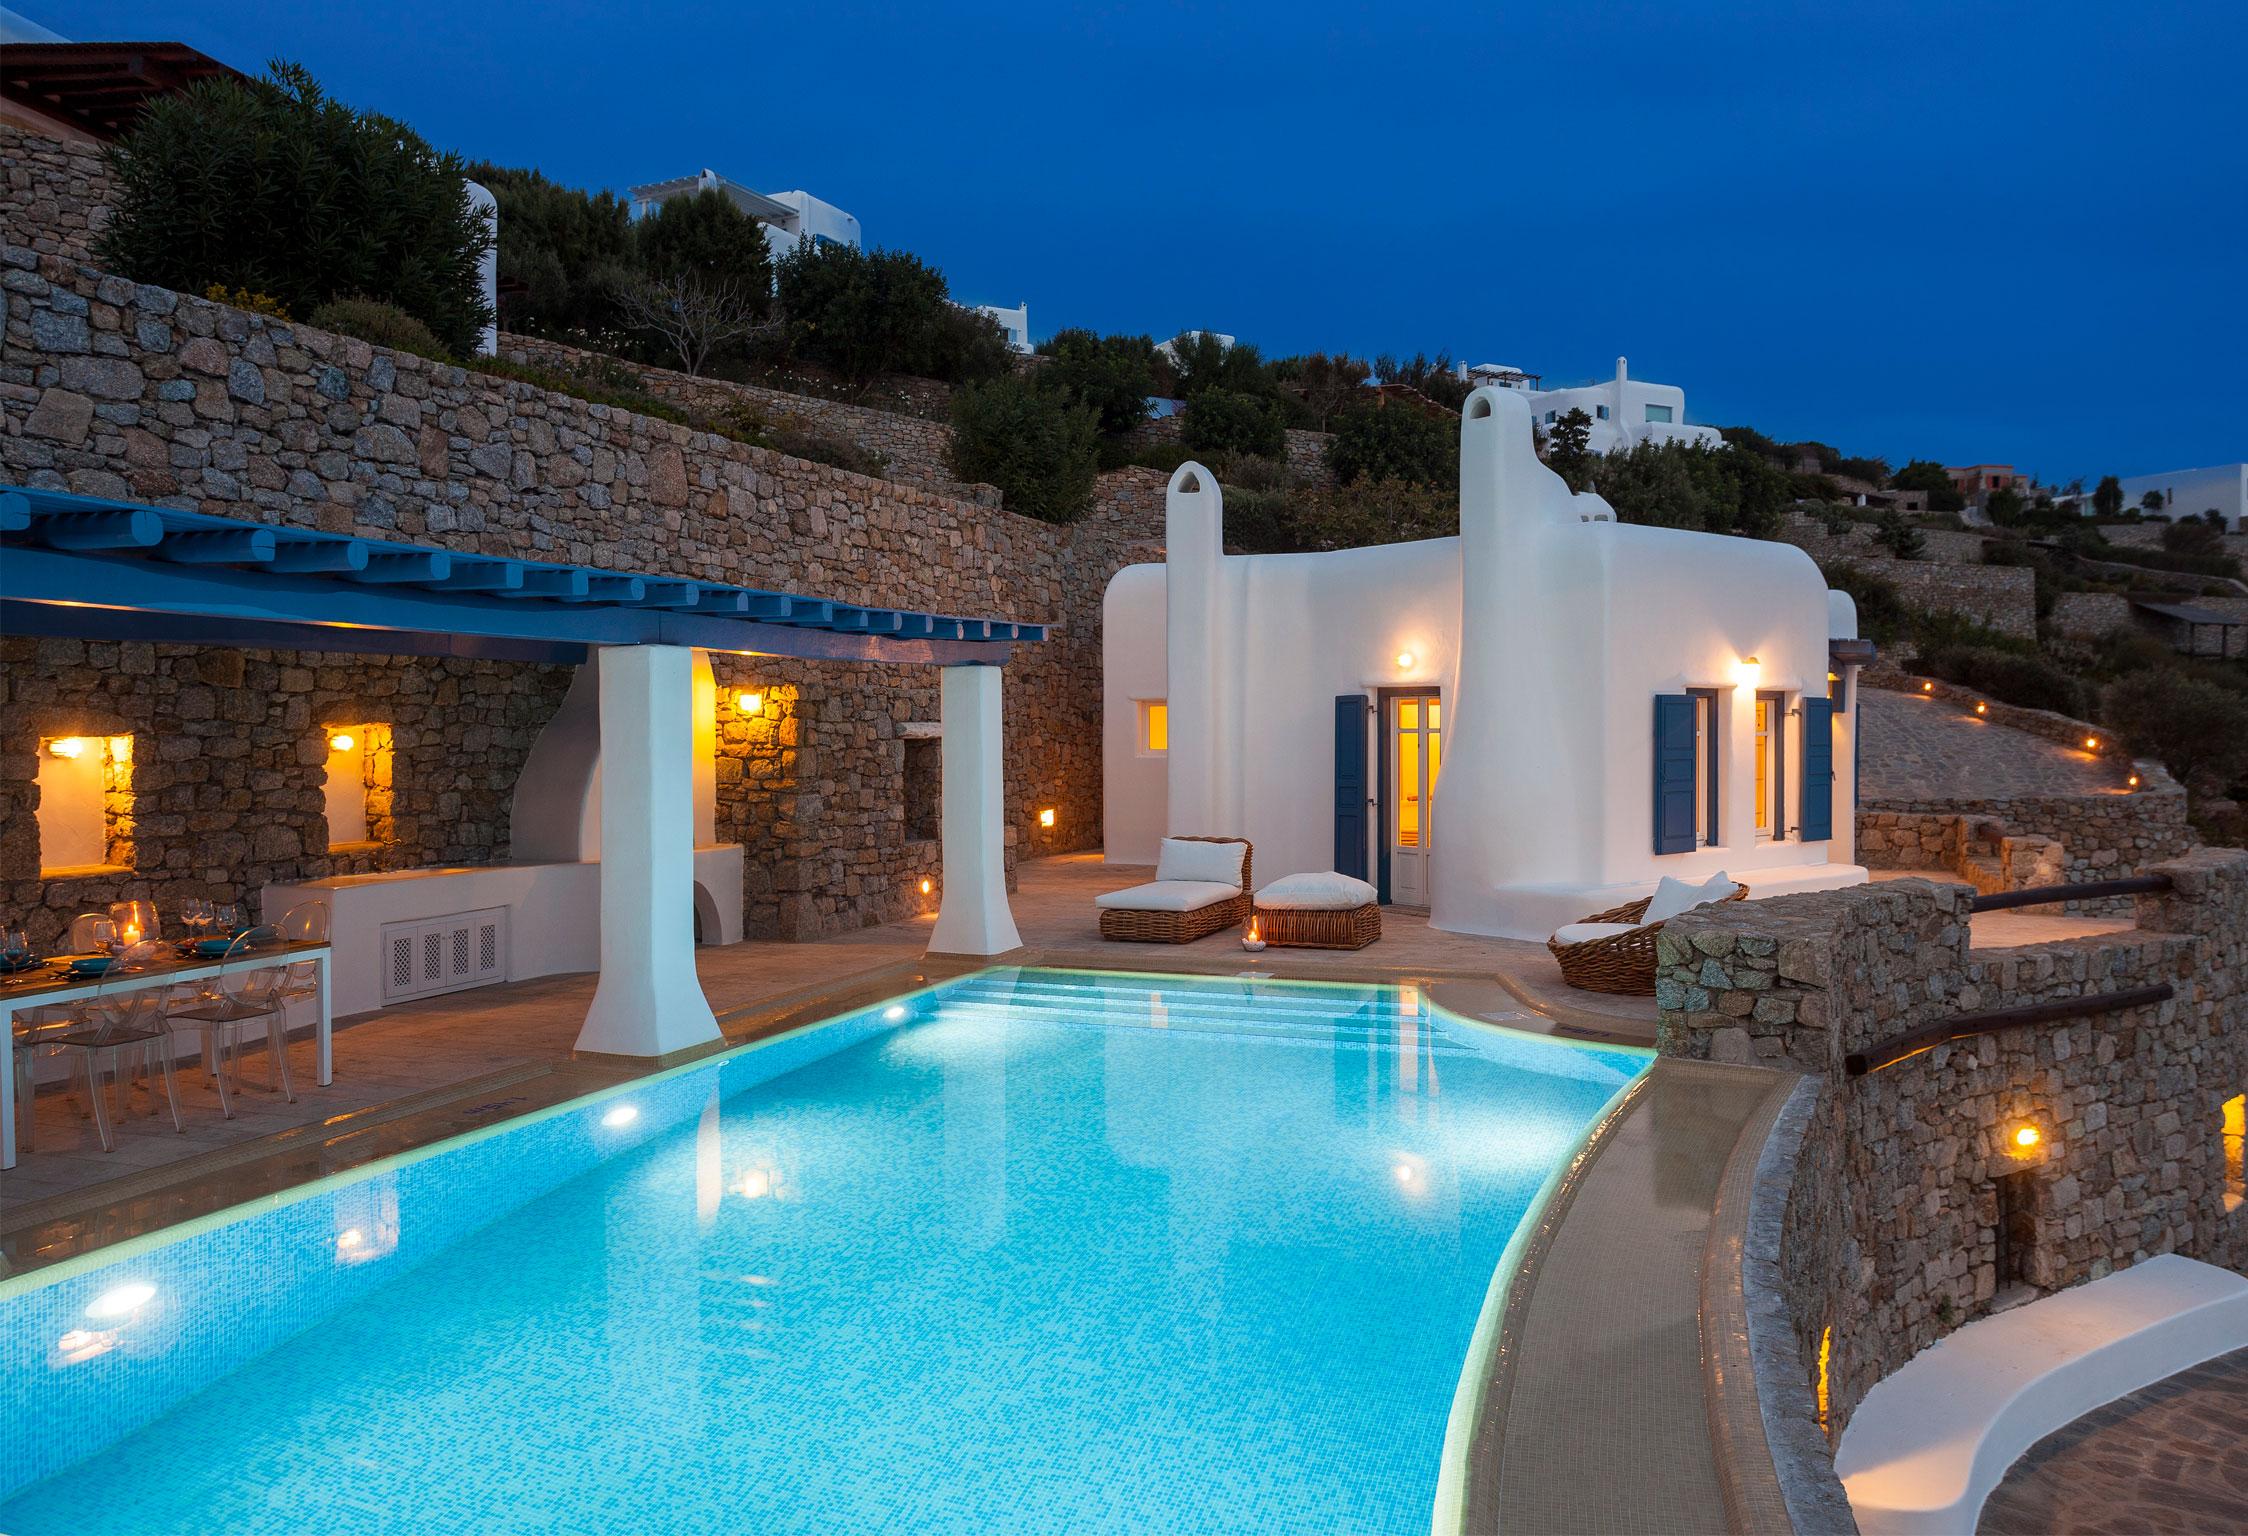 Mykonos Villa Zafira 3 jumbotron image